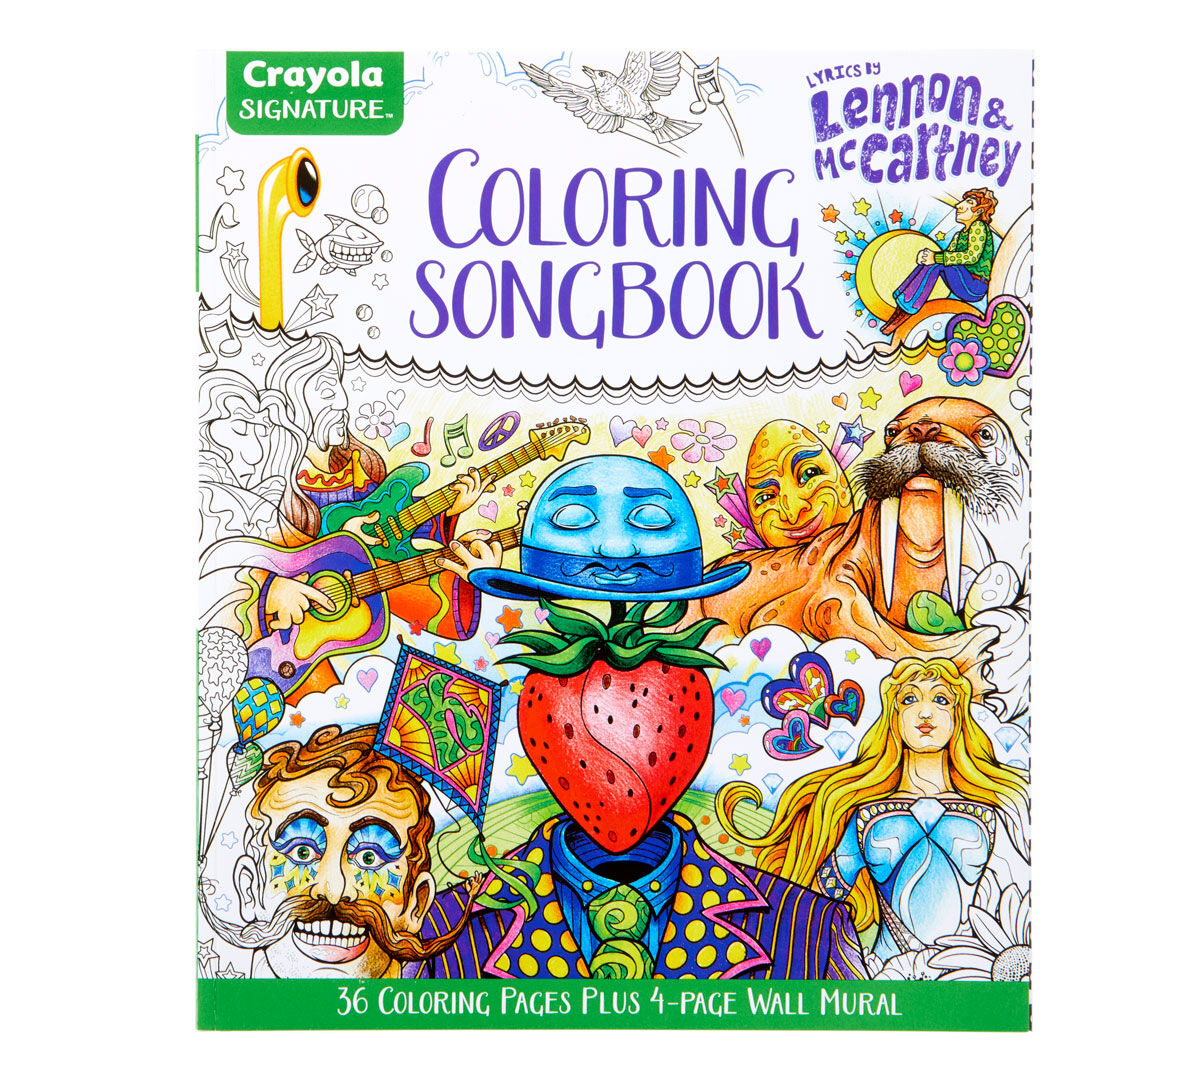 Lennon And McCartney Lyrics Coloring Book Crayola.com Crayola